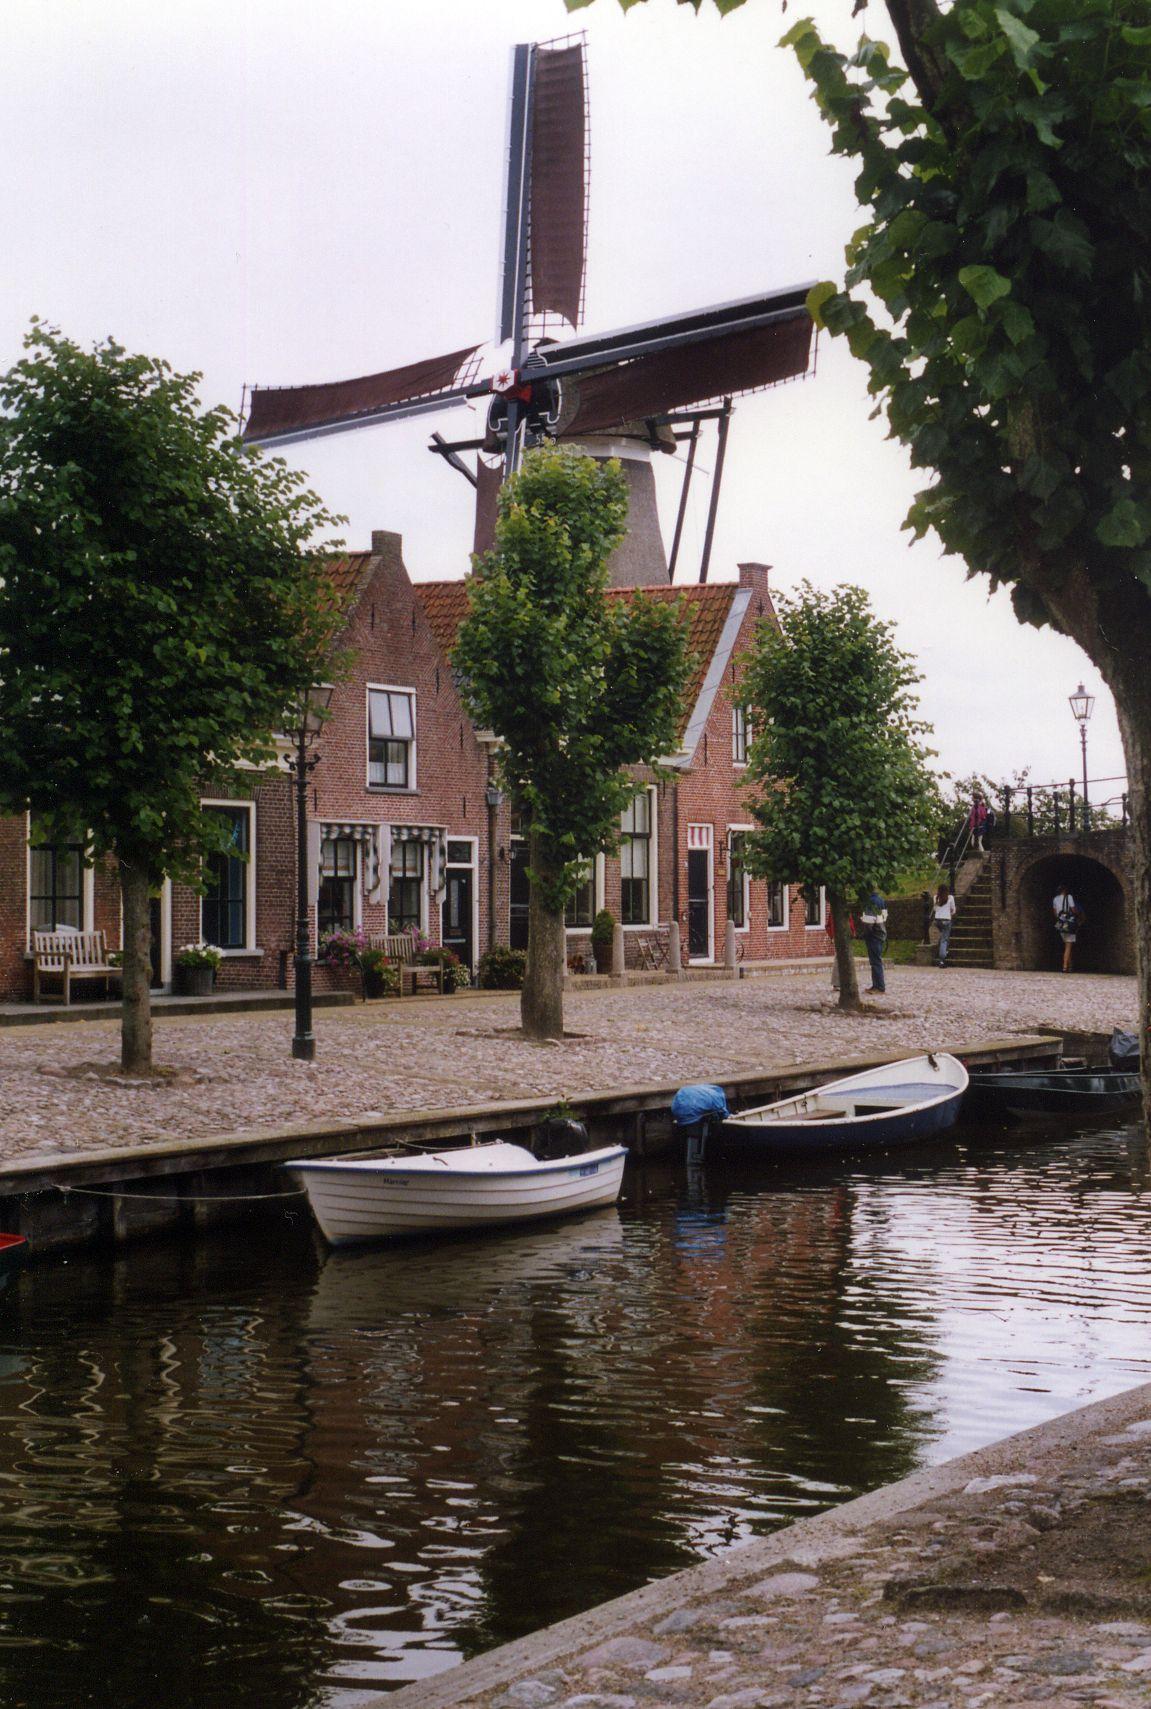 Voyage aux Pays-Bas, août 2005 (4) : Frise (Sloten, Hindeloopen, IJlst, Openluchtmuseum)